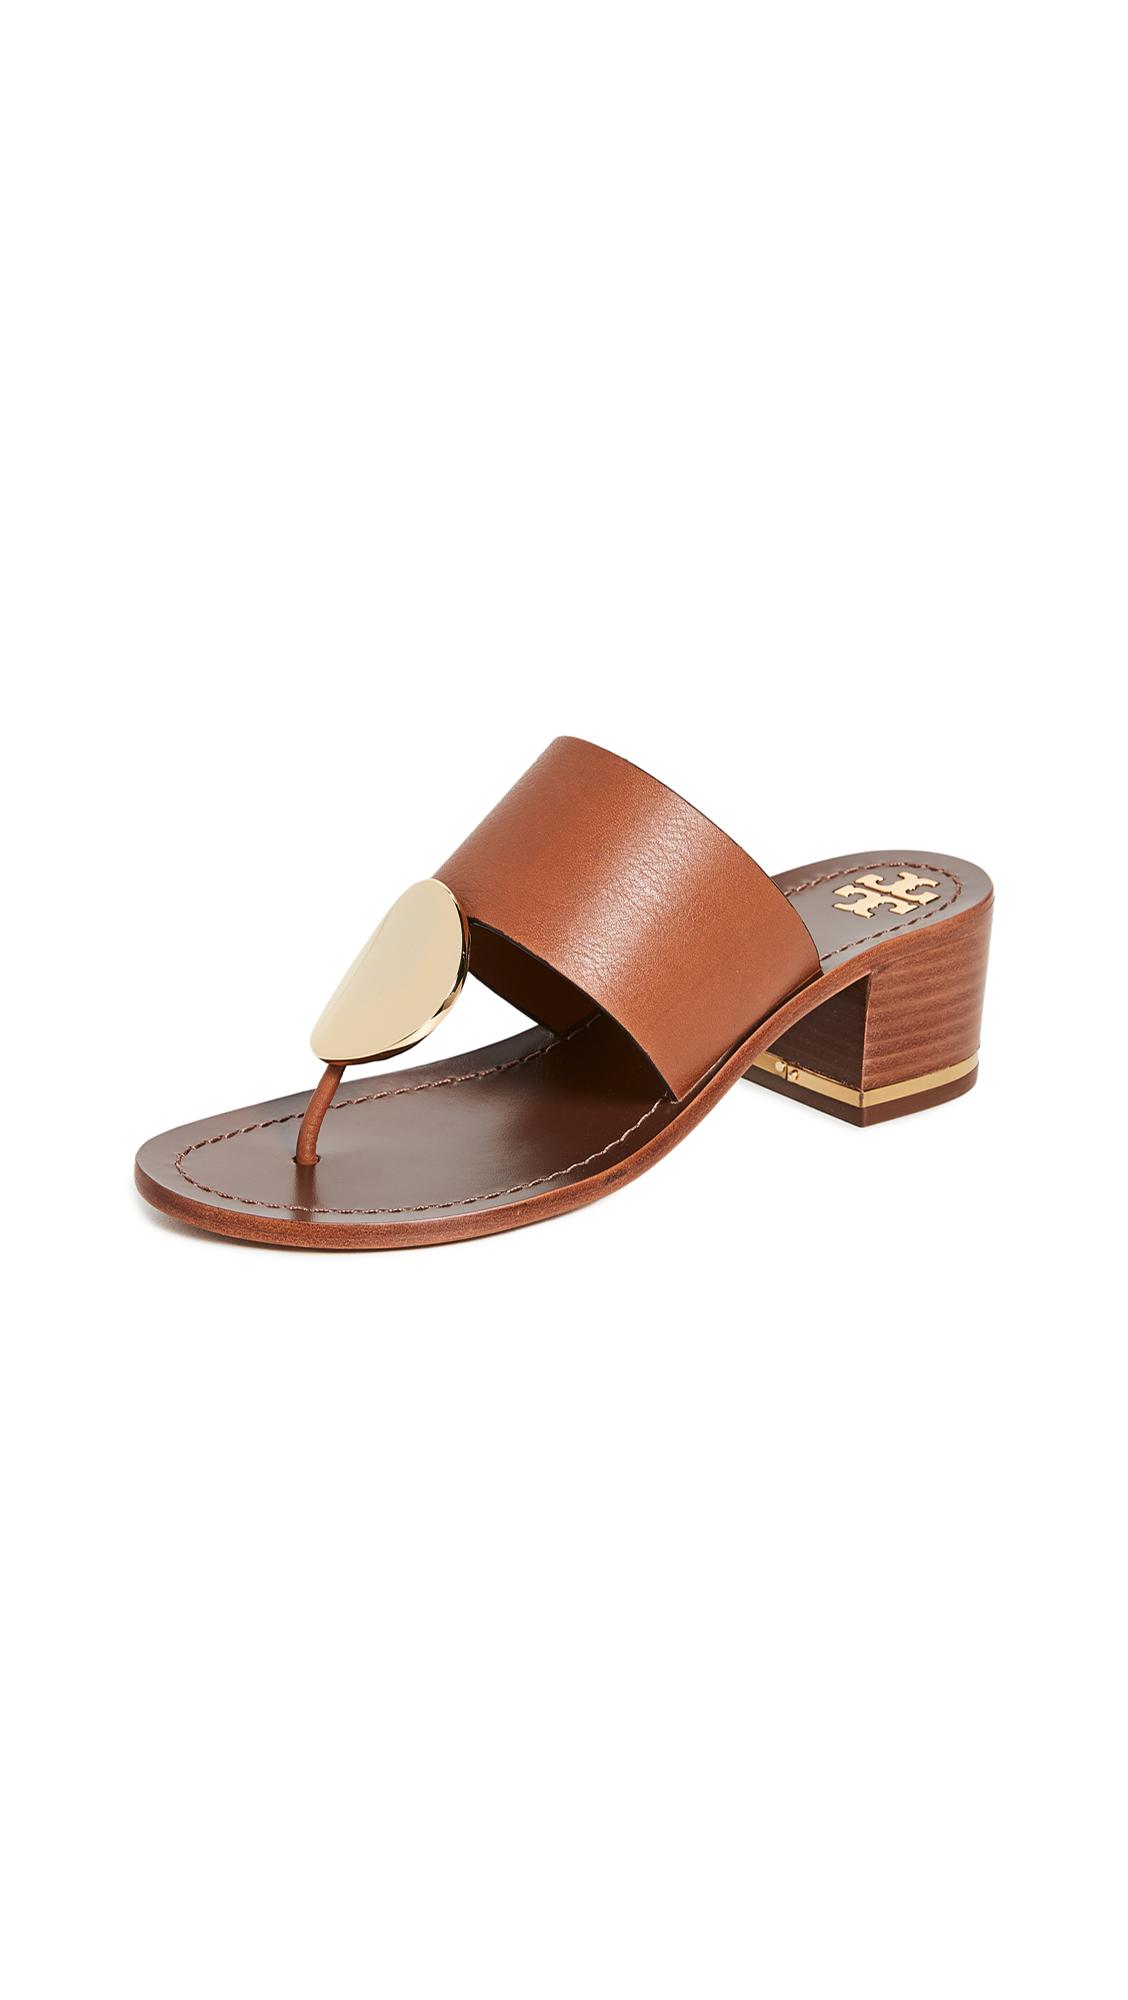 Buy Tory Burch 45mm Patos Disk Sandals online, shop Tory Burch